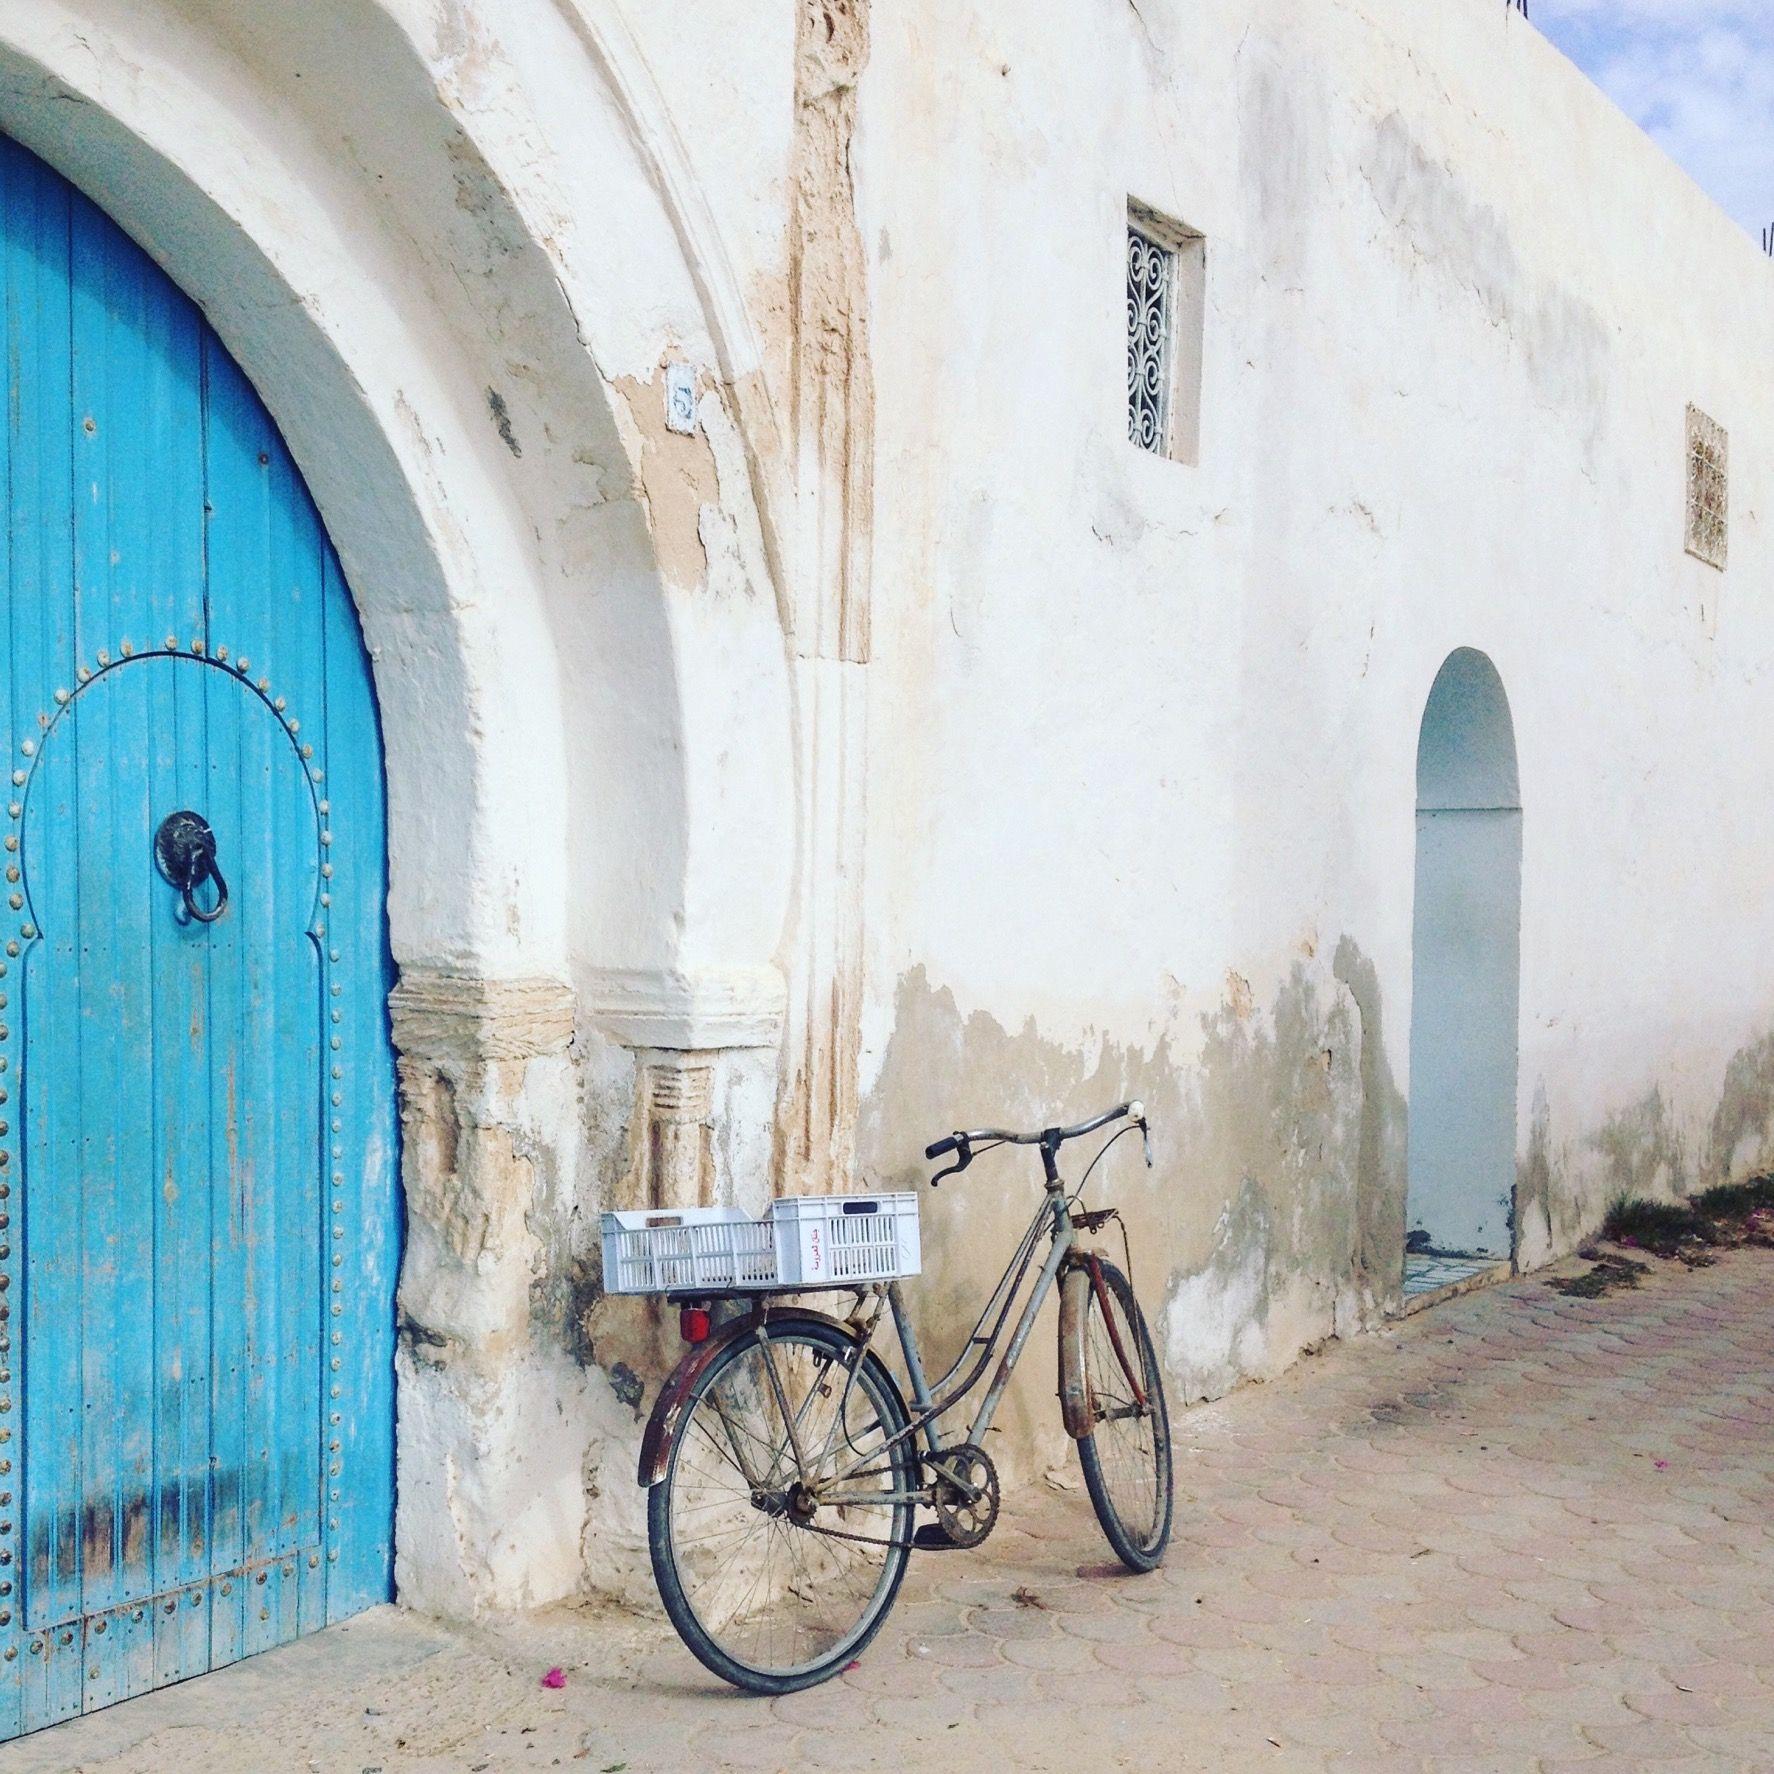 Houch ou maison traditionnelle Djerbienne Djerba Tunisie